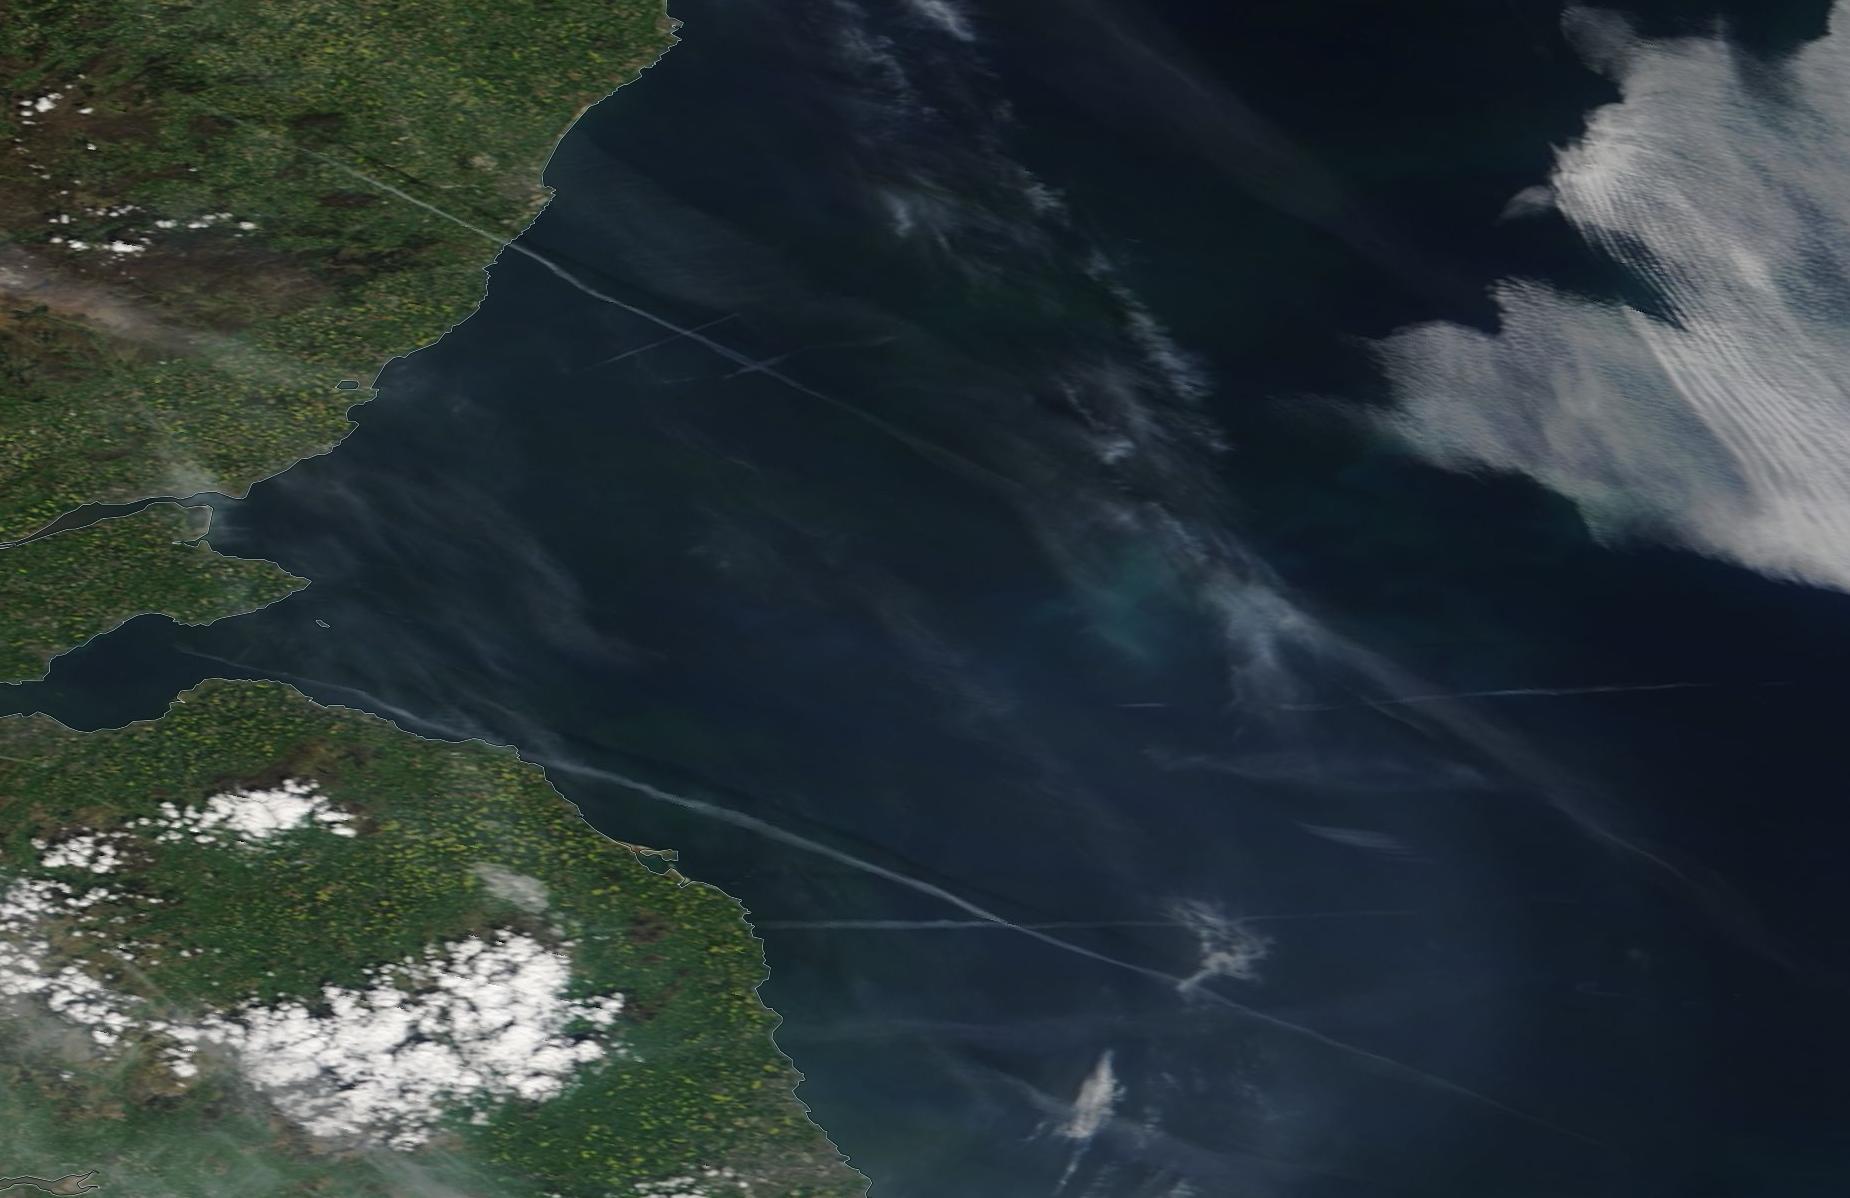 north east England, Fife chemtrail geoengineering May 15 2019 ...https://go.nasa.gov/2JIXbBT